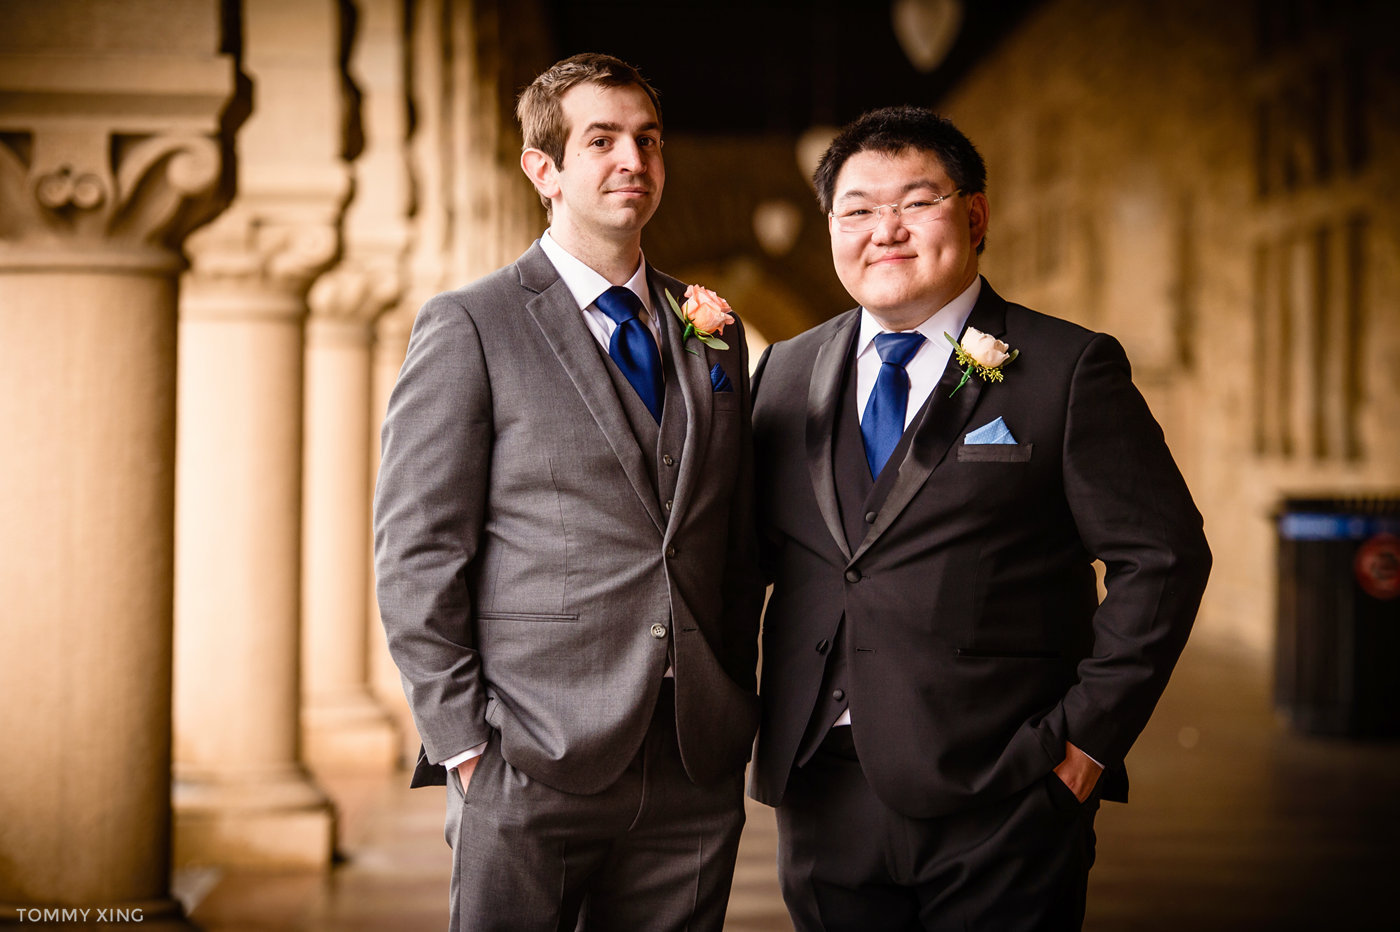 STANFORD MEMORIAL CHURCH WEDDING - Wenjie & Chengcheng - SAN FRANCISCO BAY AREA 斯坦福教堂婚礼跟拍 - 洛杉矶婚礼婚纱照摄影师 Tommy Xing Photography138.jpg